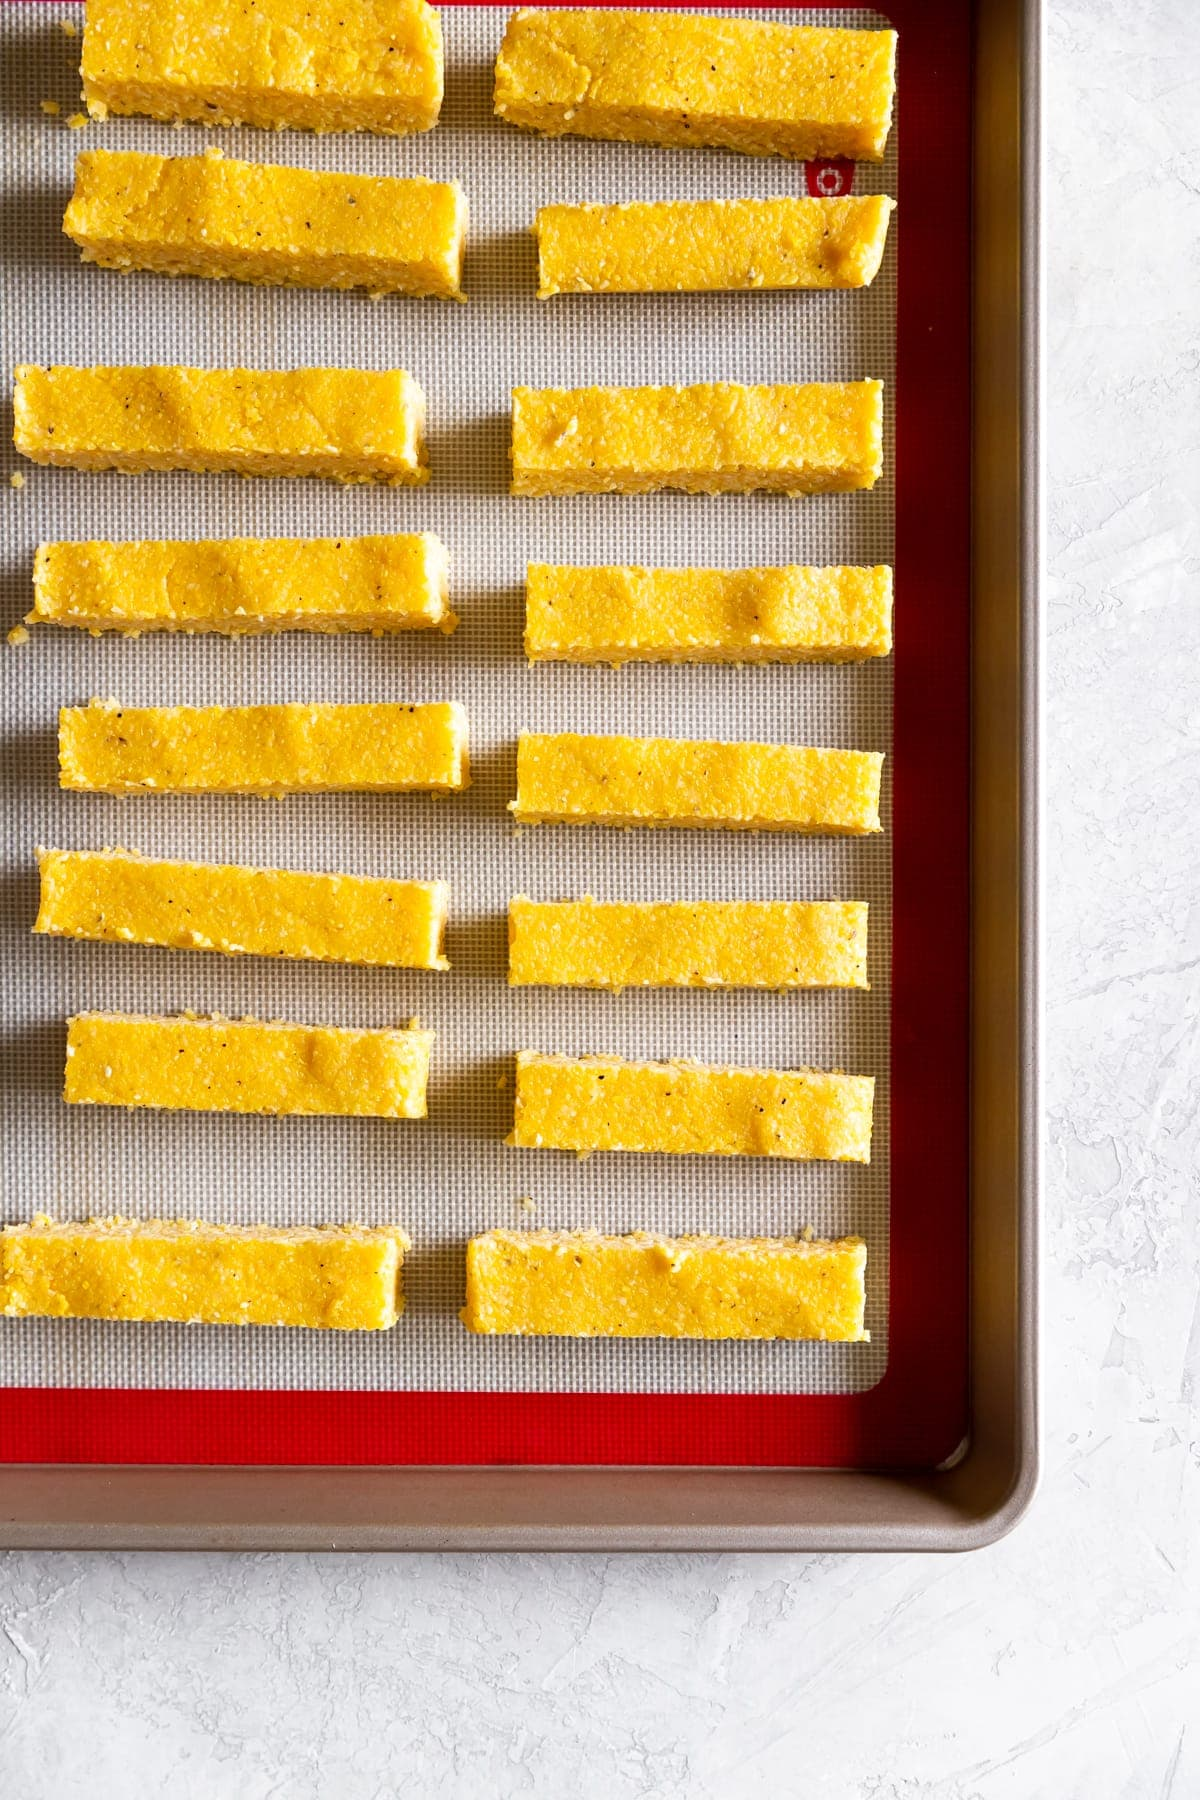 cut up polenta on a baking sheet